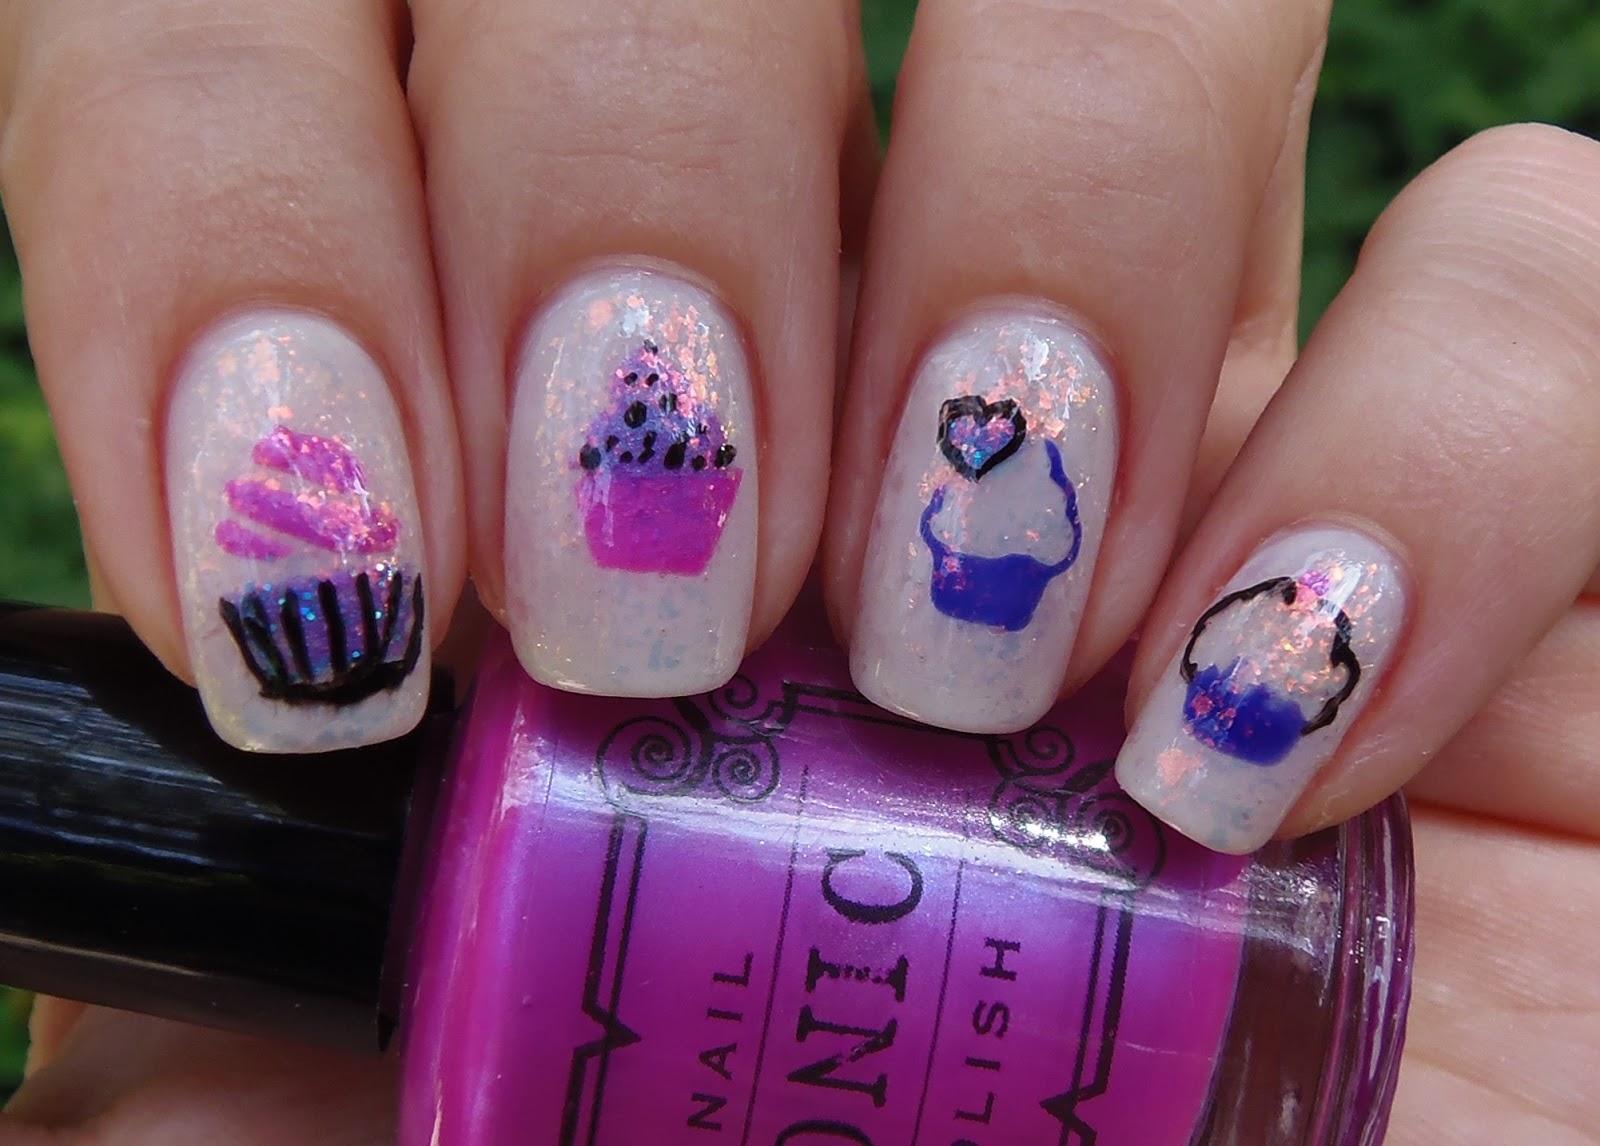 Sparkly Vernis: cupcake nails